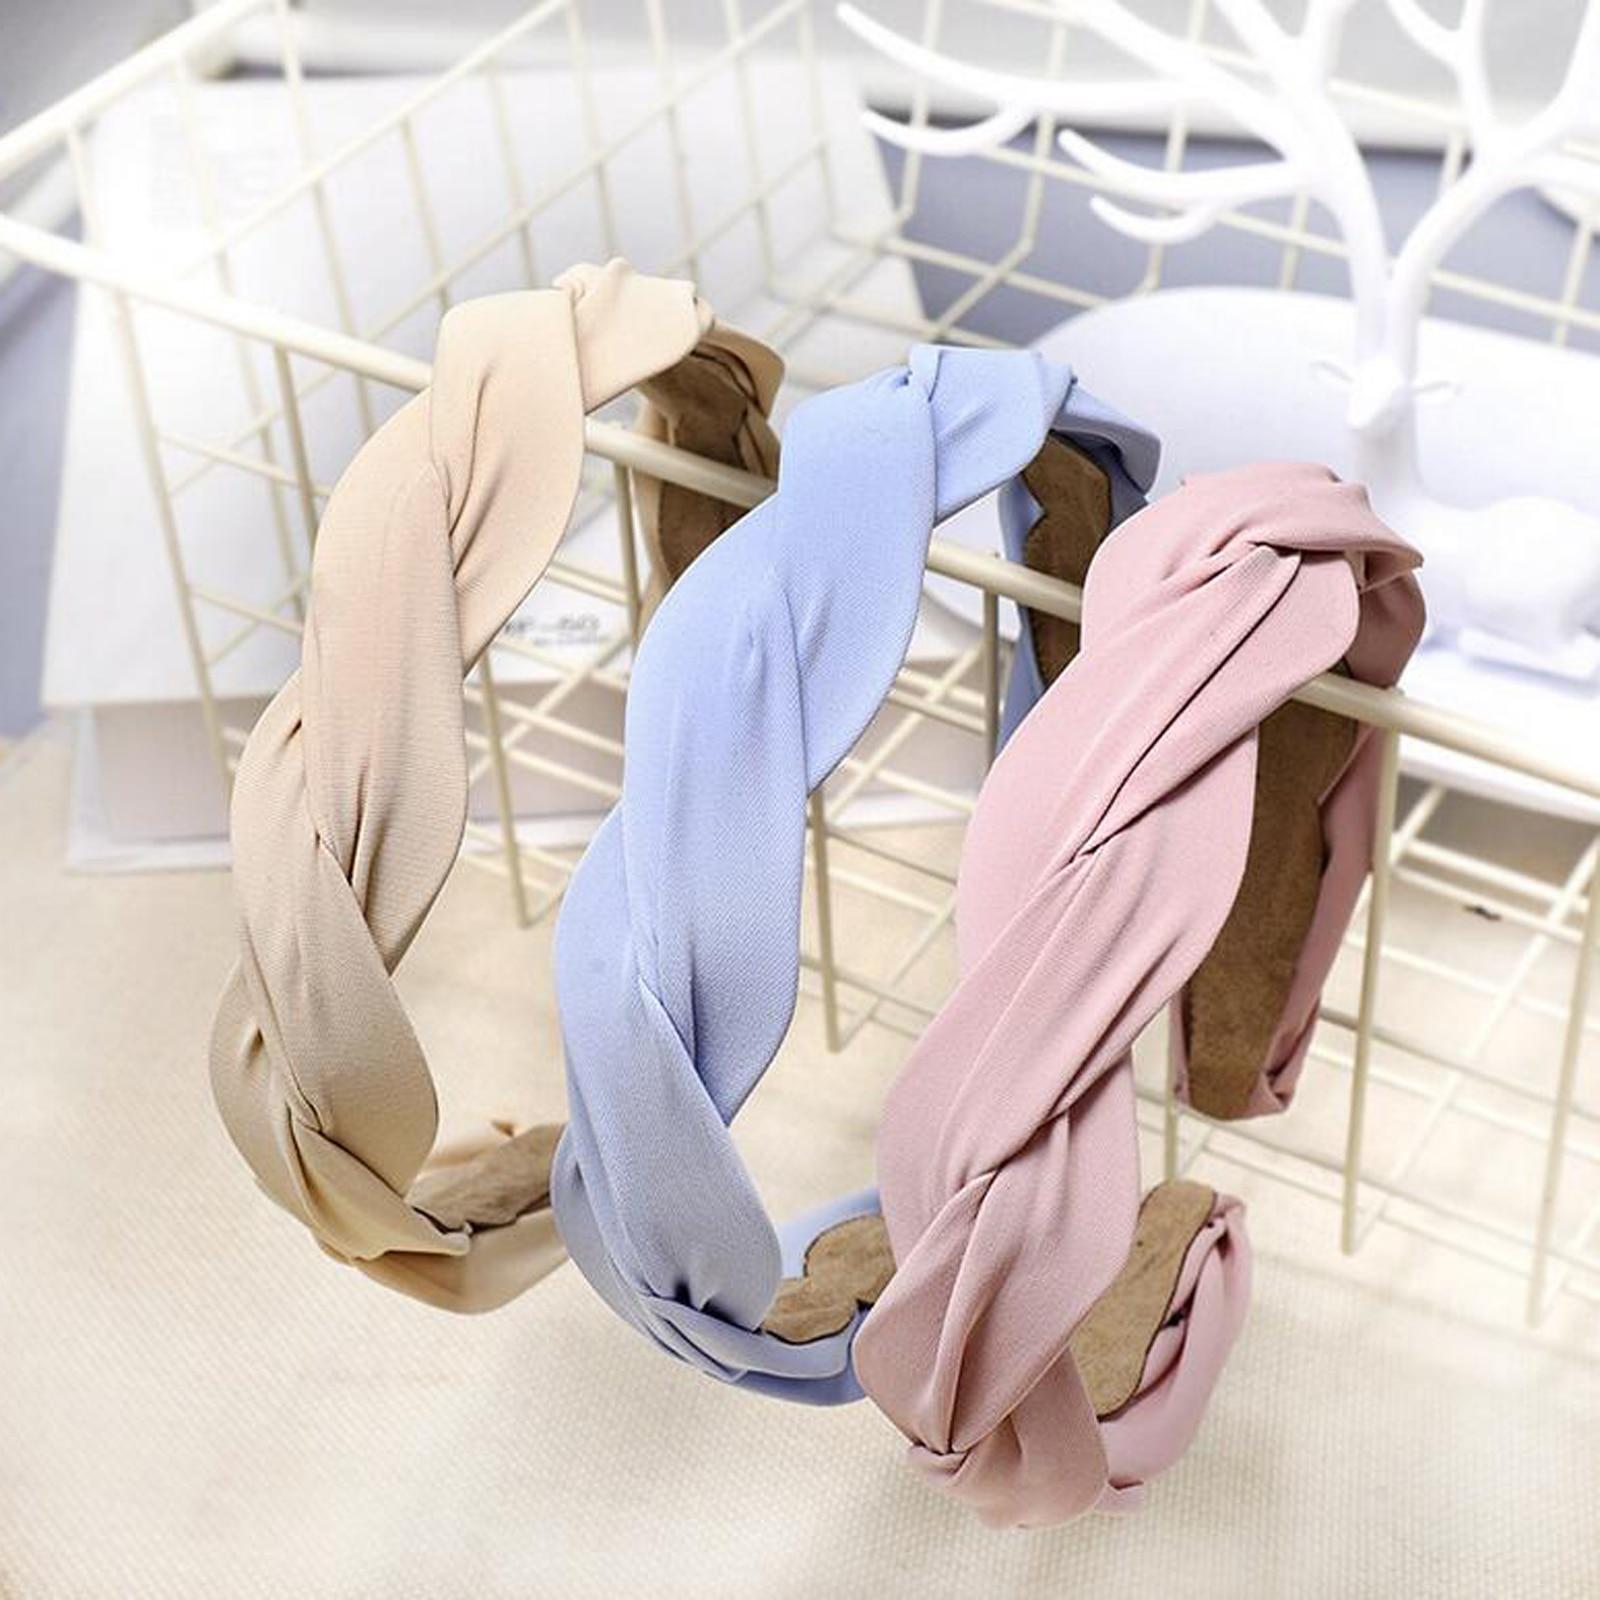 New Fashion Women Headband Solid Cloth Multi-layer Cross Knot Hairband Summer Autumn Hair Accessories Adult